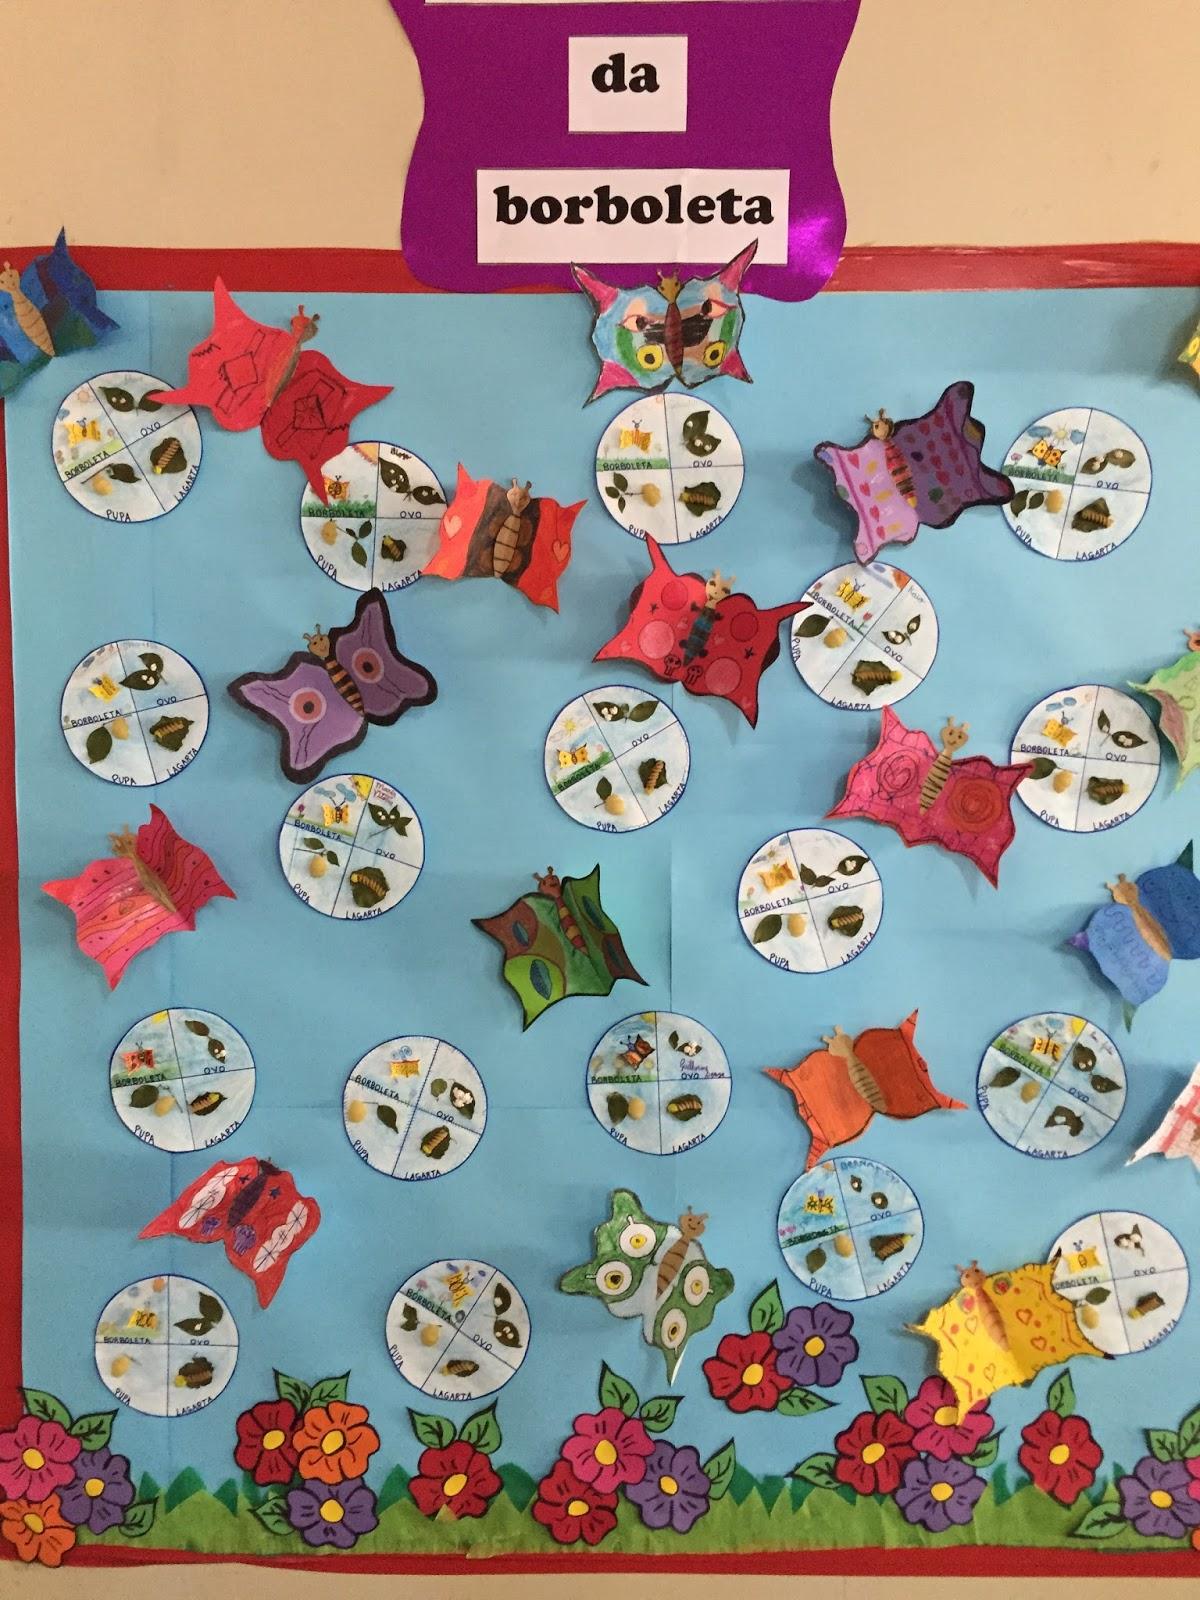 Sos professor atividades ciclo de vida da borboleta mural for Mural de natal 4 ano